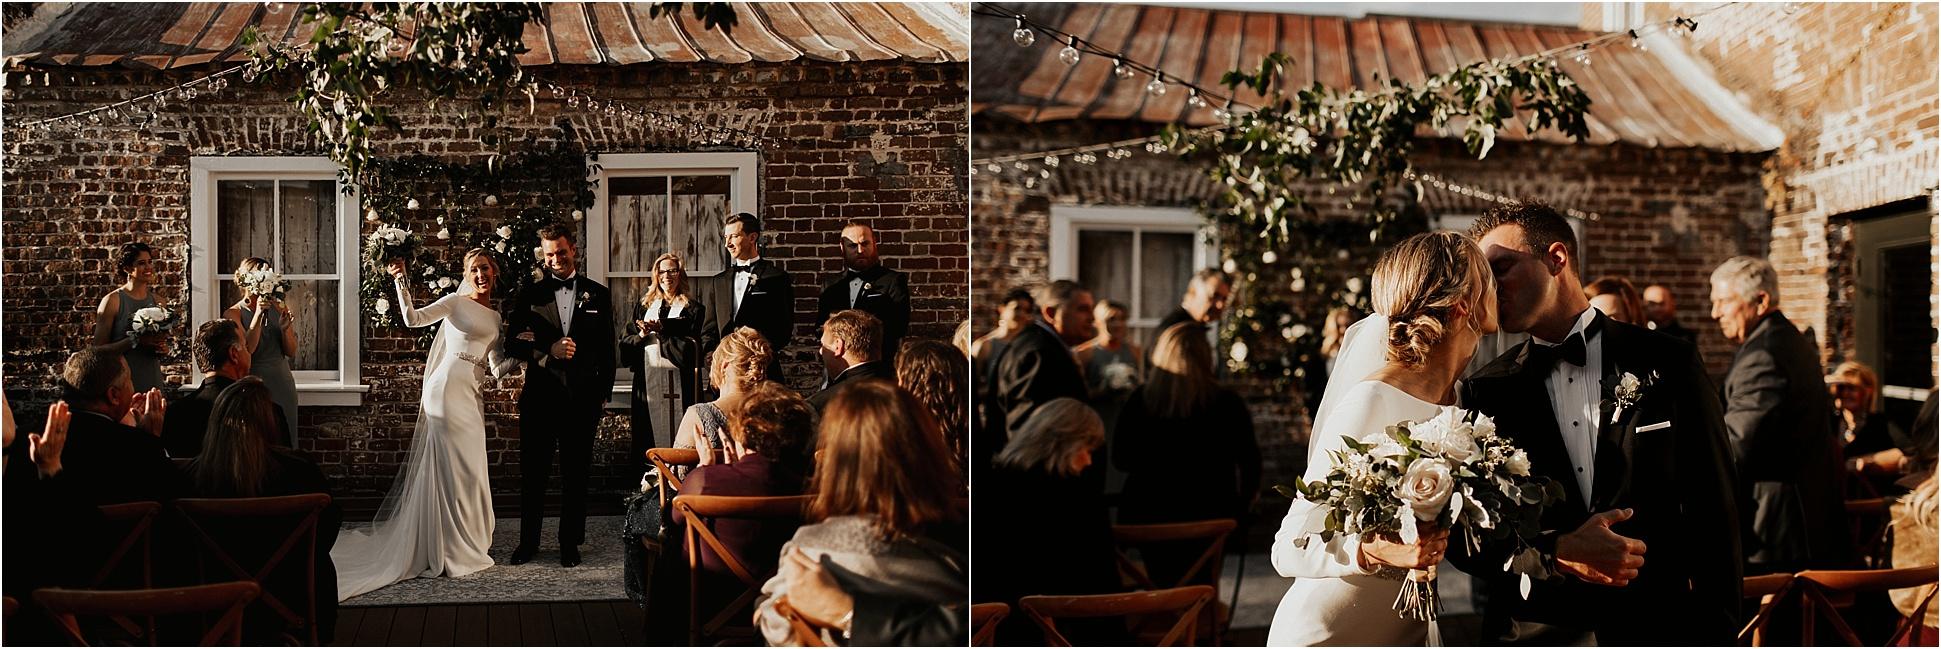 upstairs_midtown_intimate_charleston_wedding047.JPG